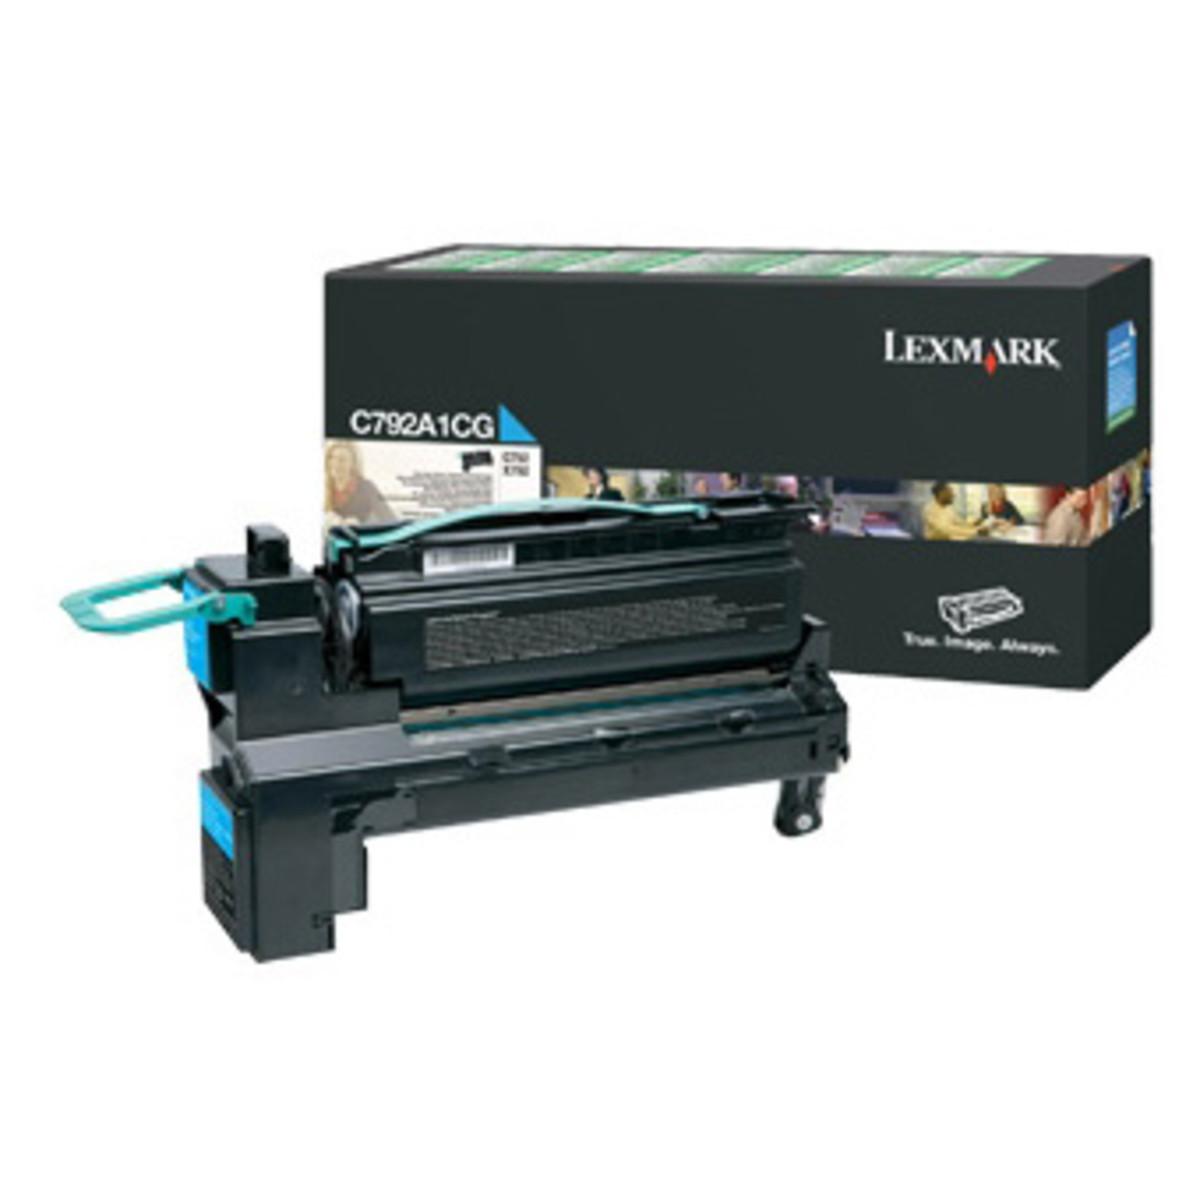 Lexmark C792A1CG Cyan Toner Cartridge